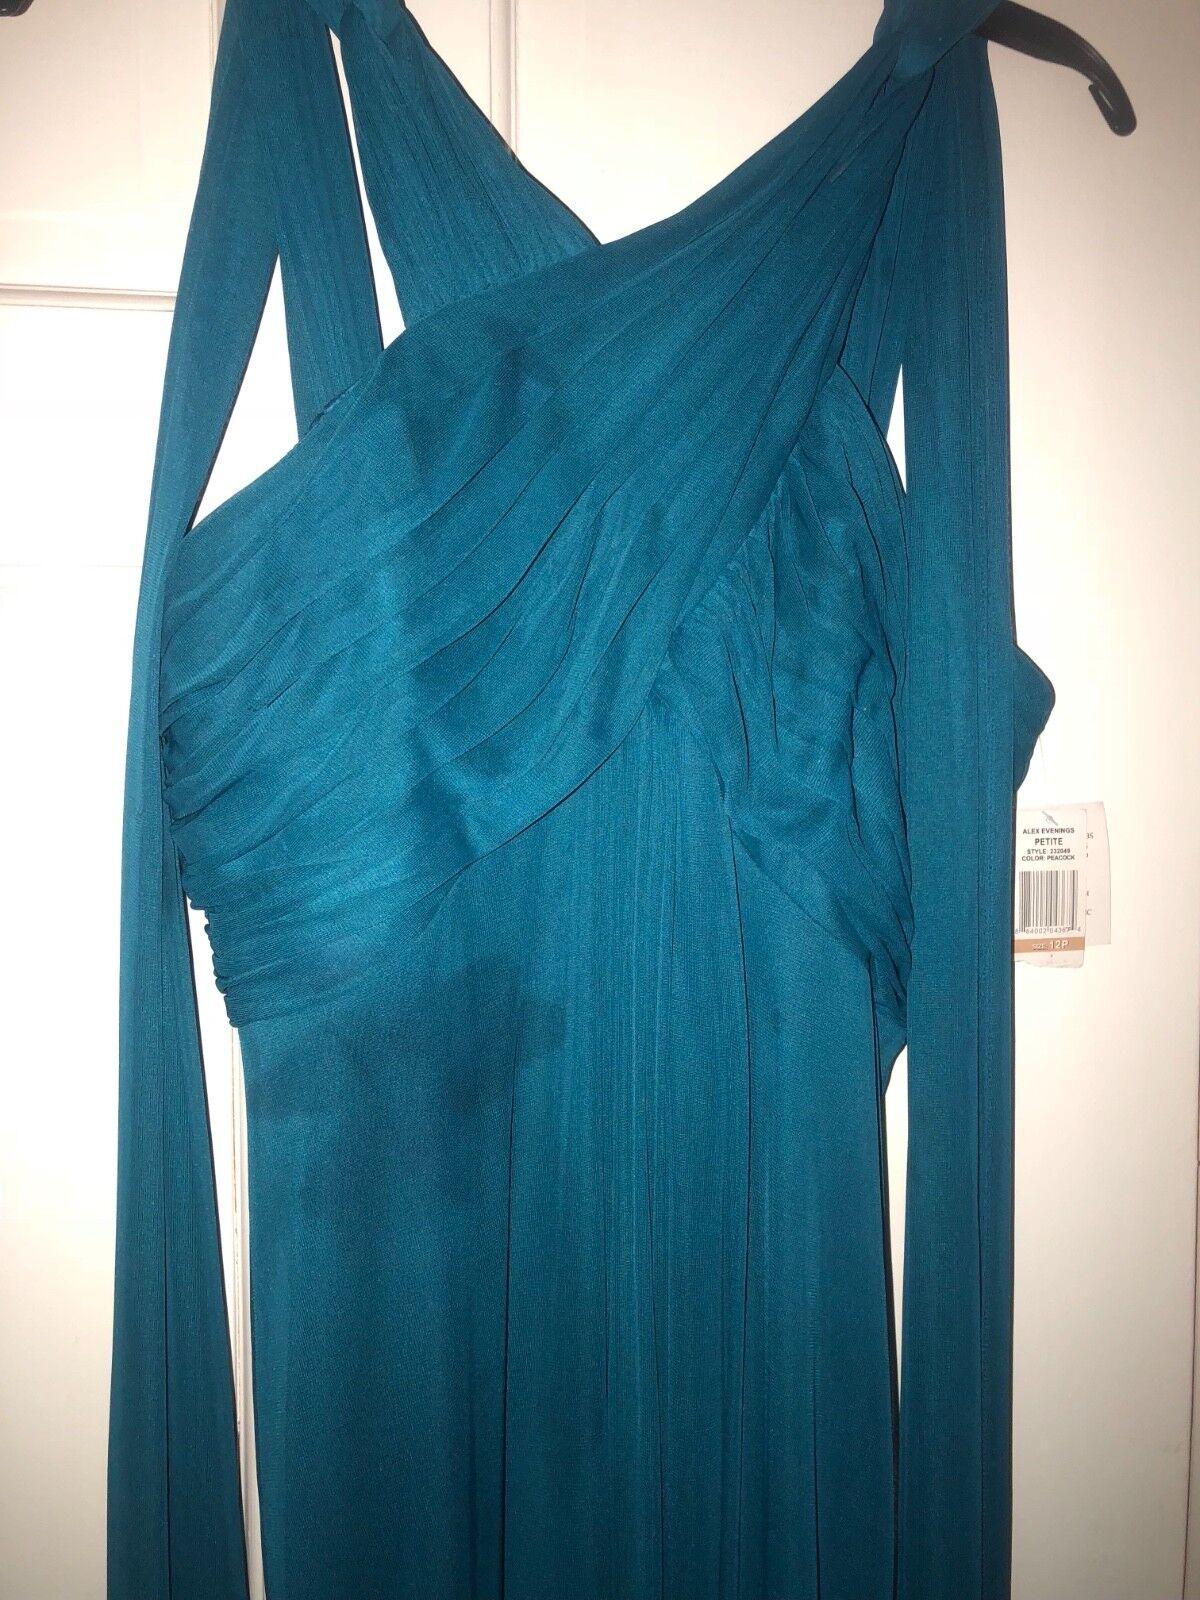 NWT Alex Evenings Gown Größe 12p